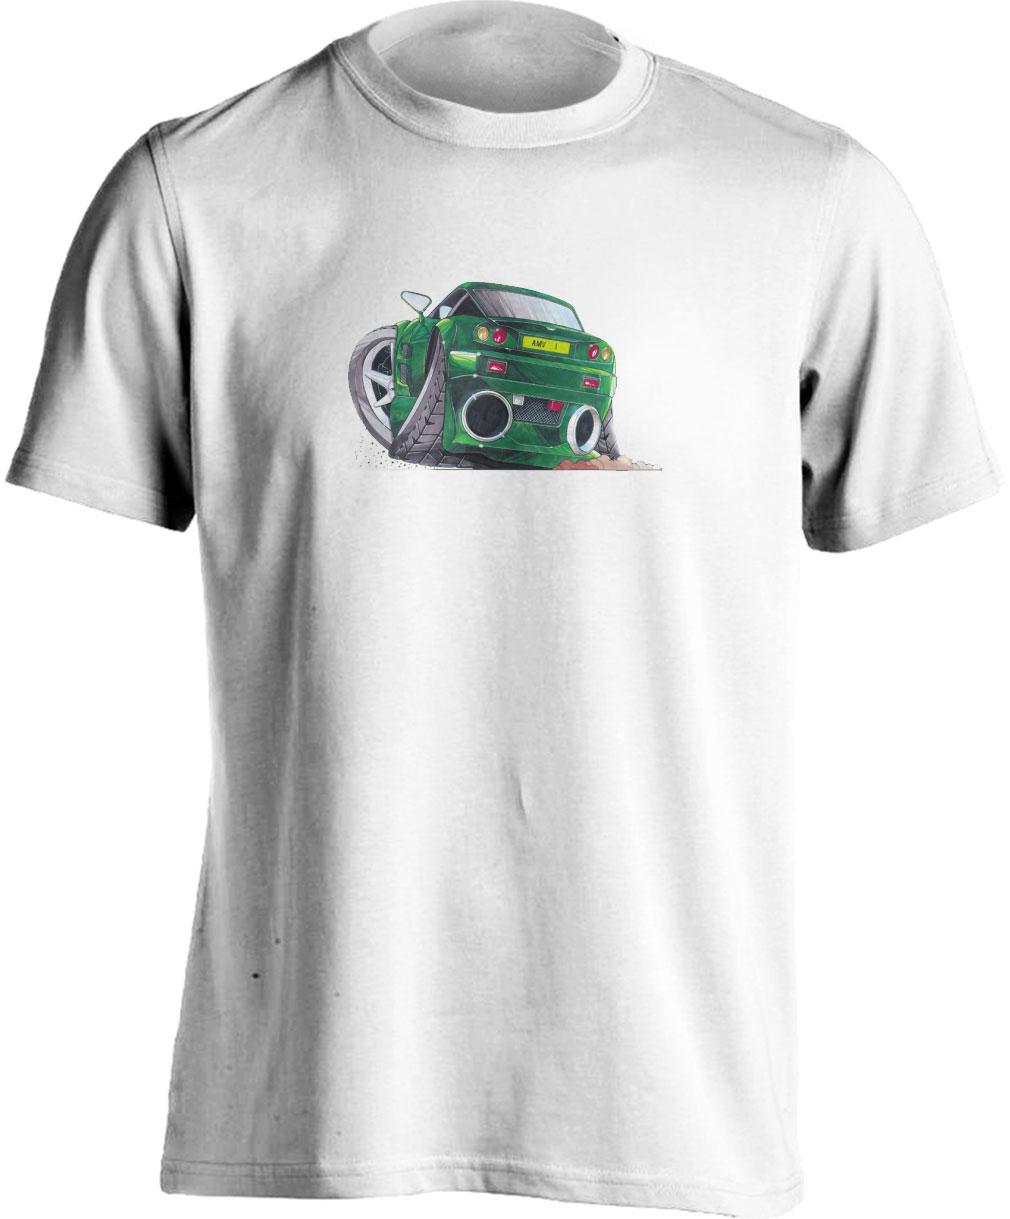 Adults Koolart Aston Martin Vantage Green 1184 T Shirt